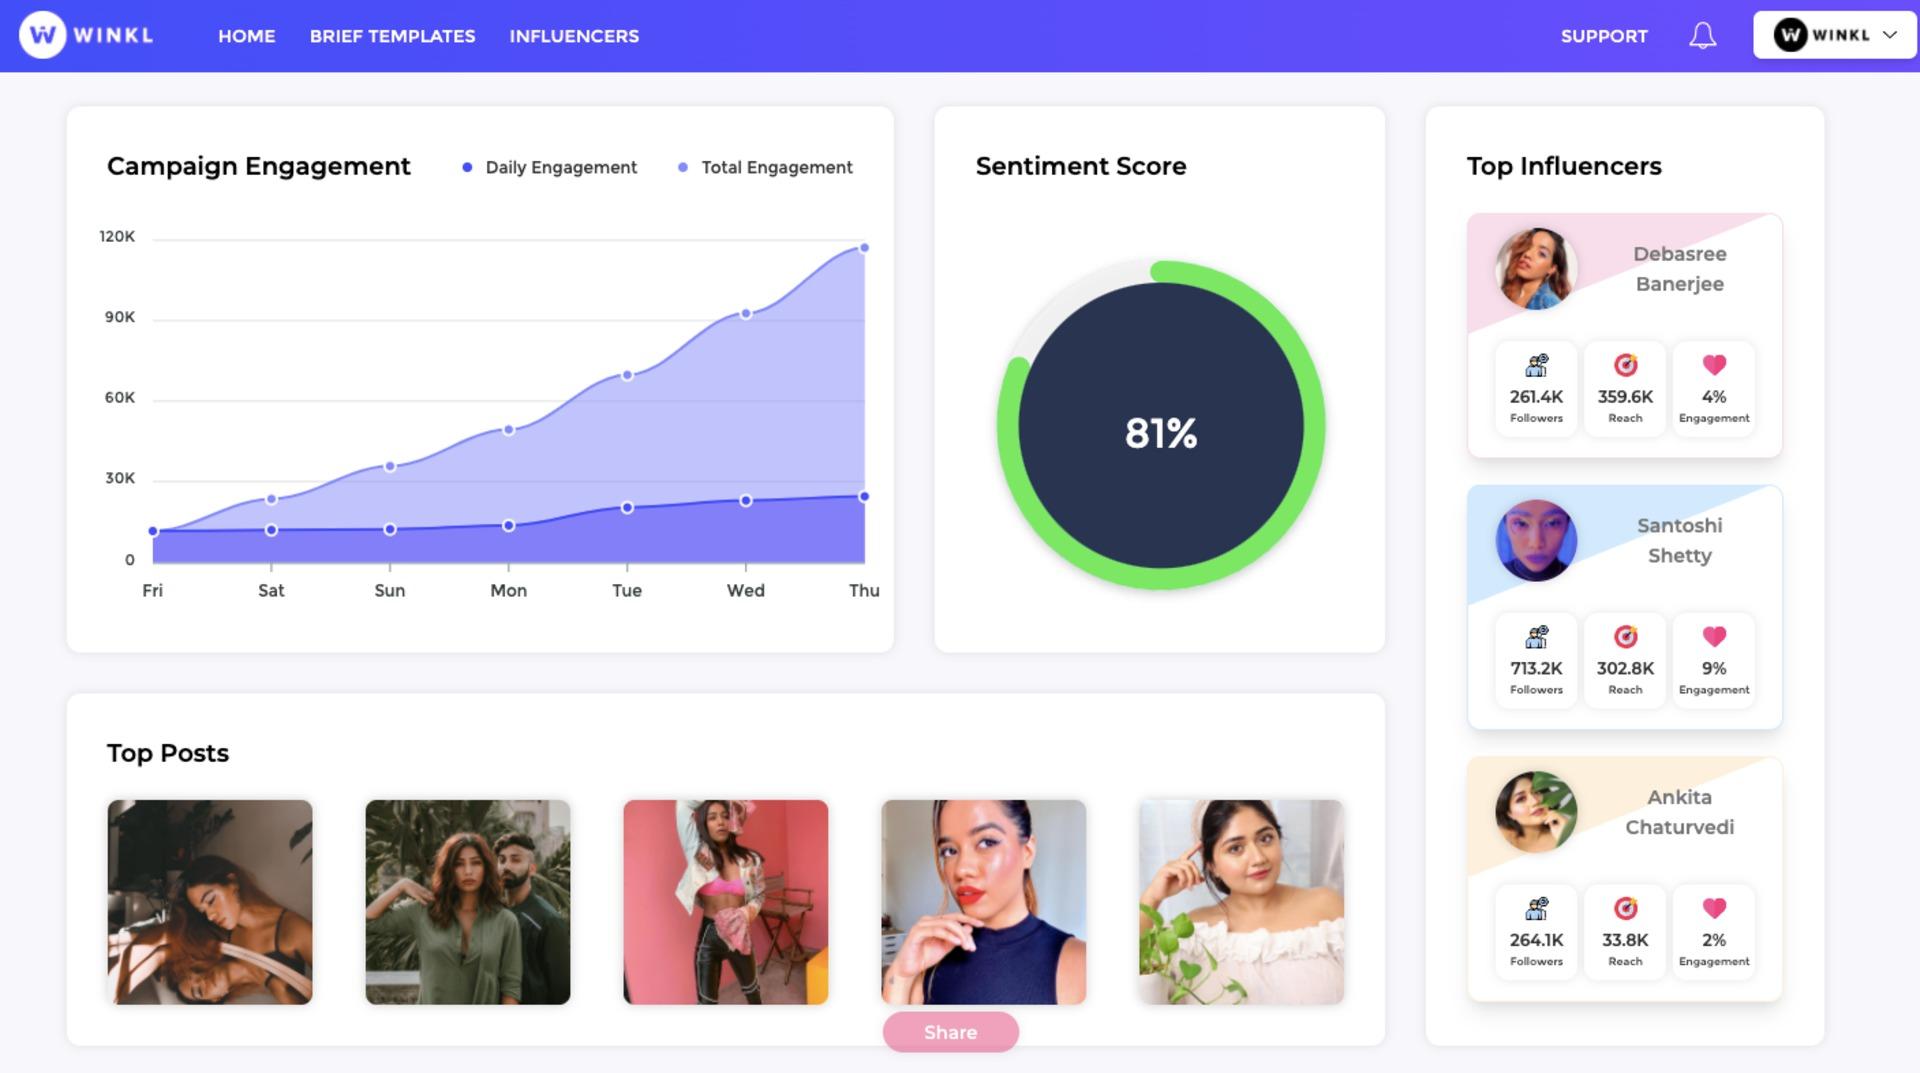 Winkl on Influener Marketing - Screenshot 2020-07-16 at 12